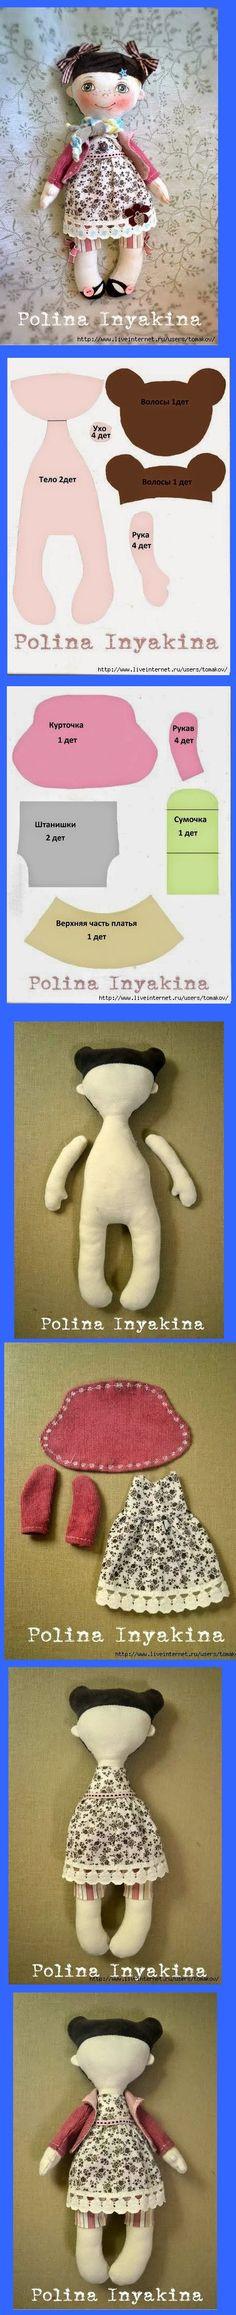 https://www.pinterest.com/maguro0763/doll-making/